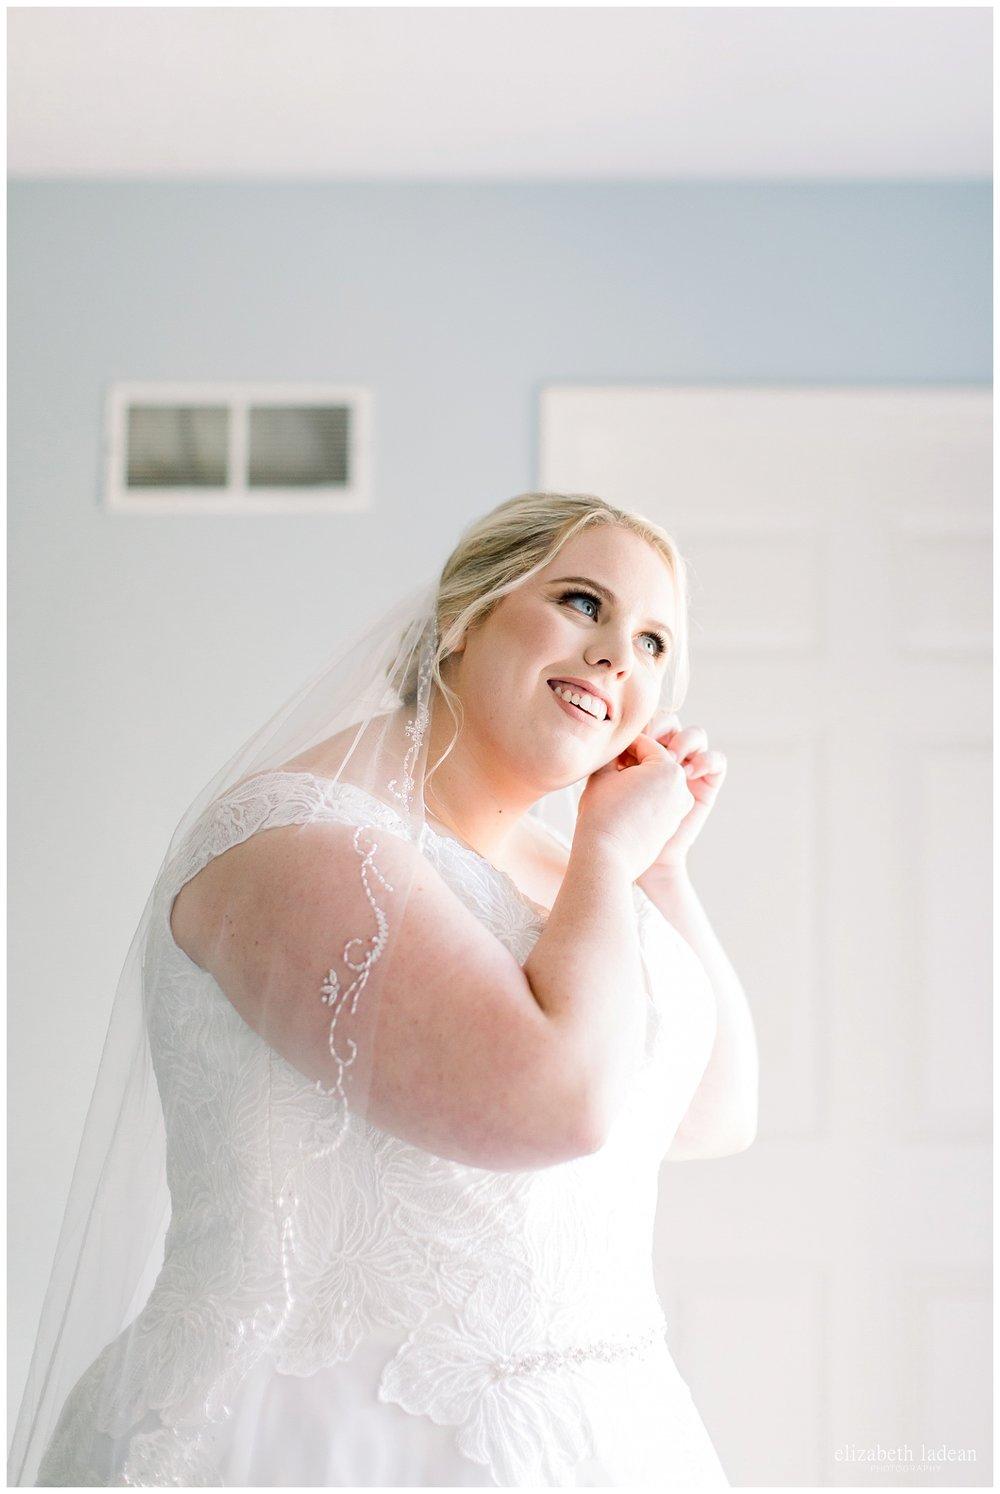 -Legact-at-Green-Hills-Kansas-City-Wedding-Photographer-L+B-1020-elizabeth-ladean-photography-photo_2075.jpg